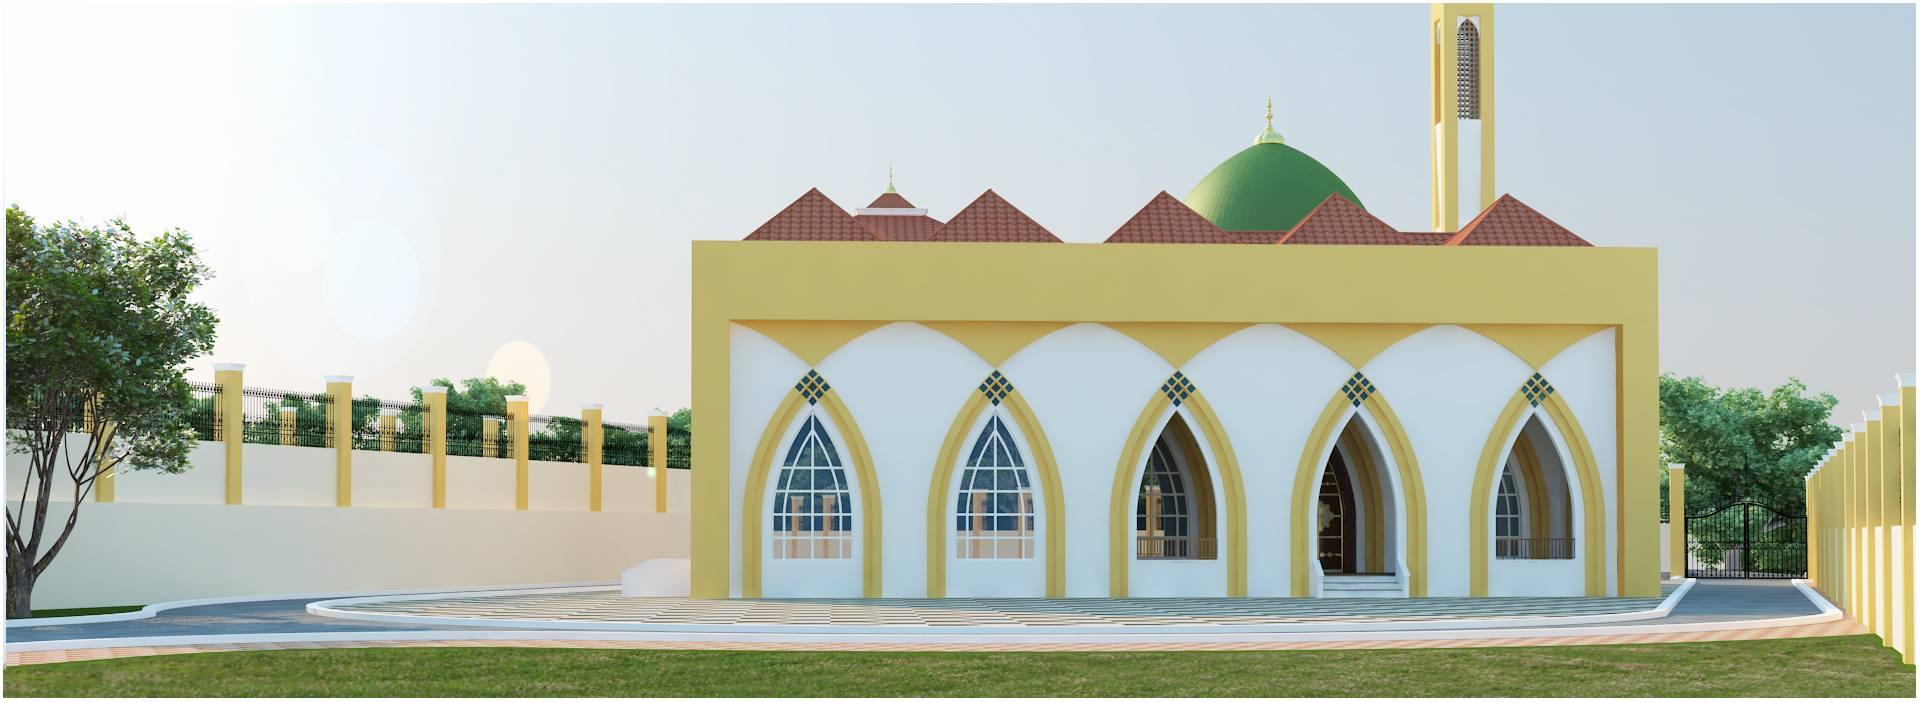 Masjid Al Amal, Tarlac Philippines 4